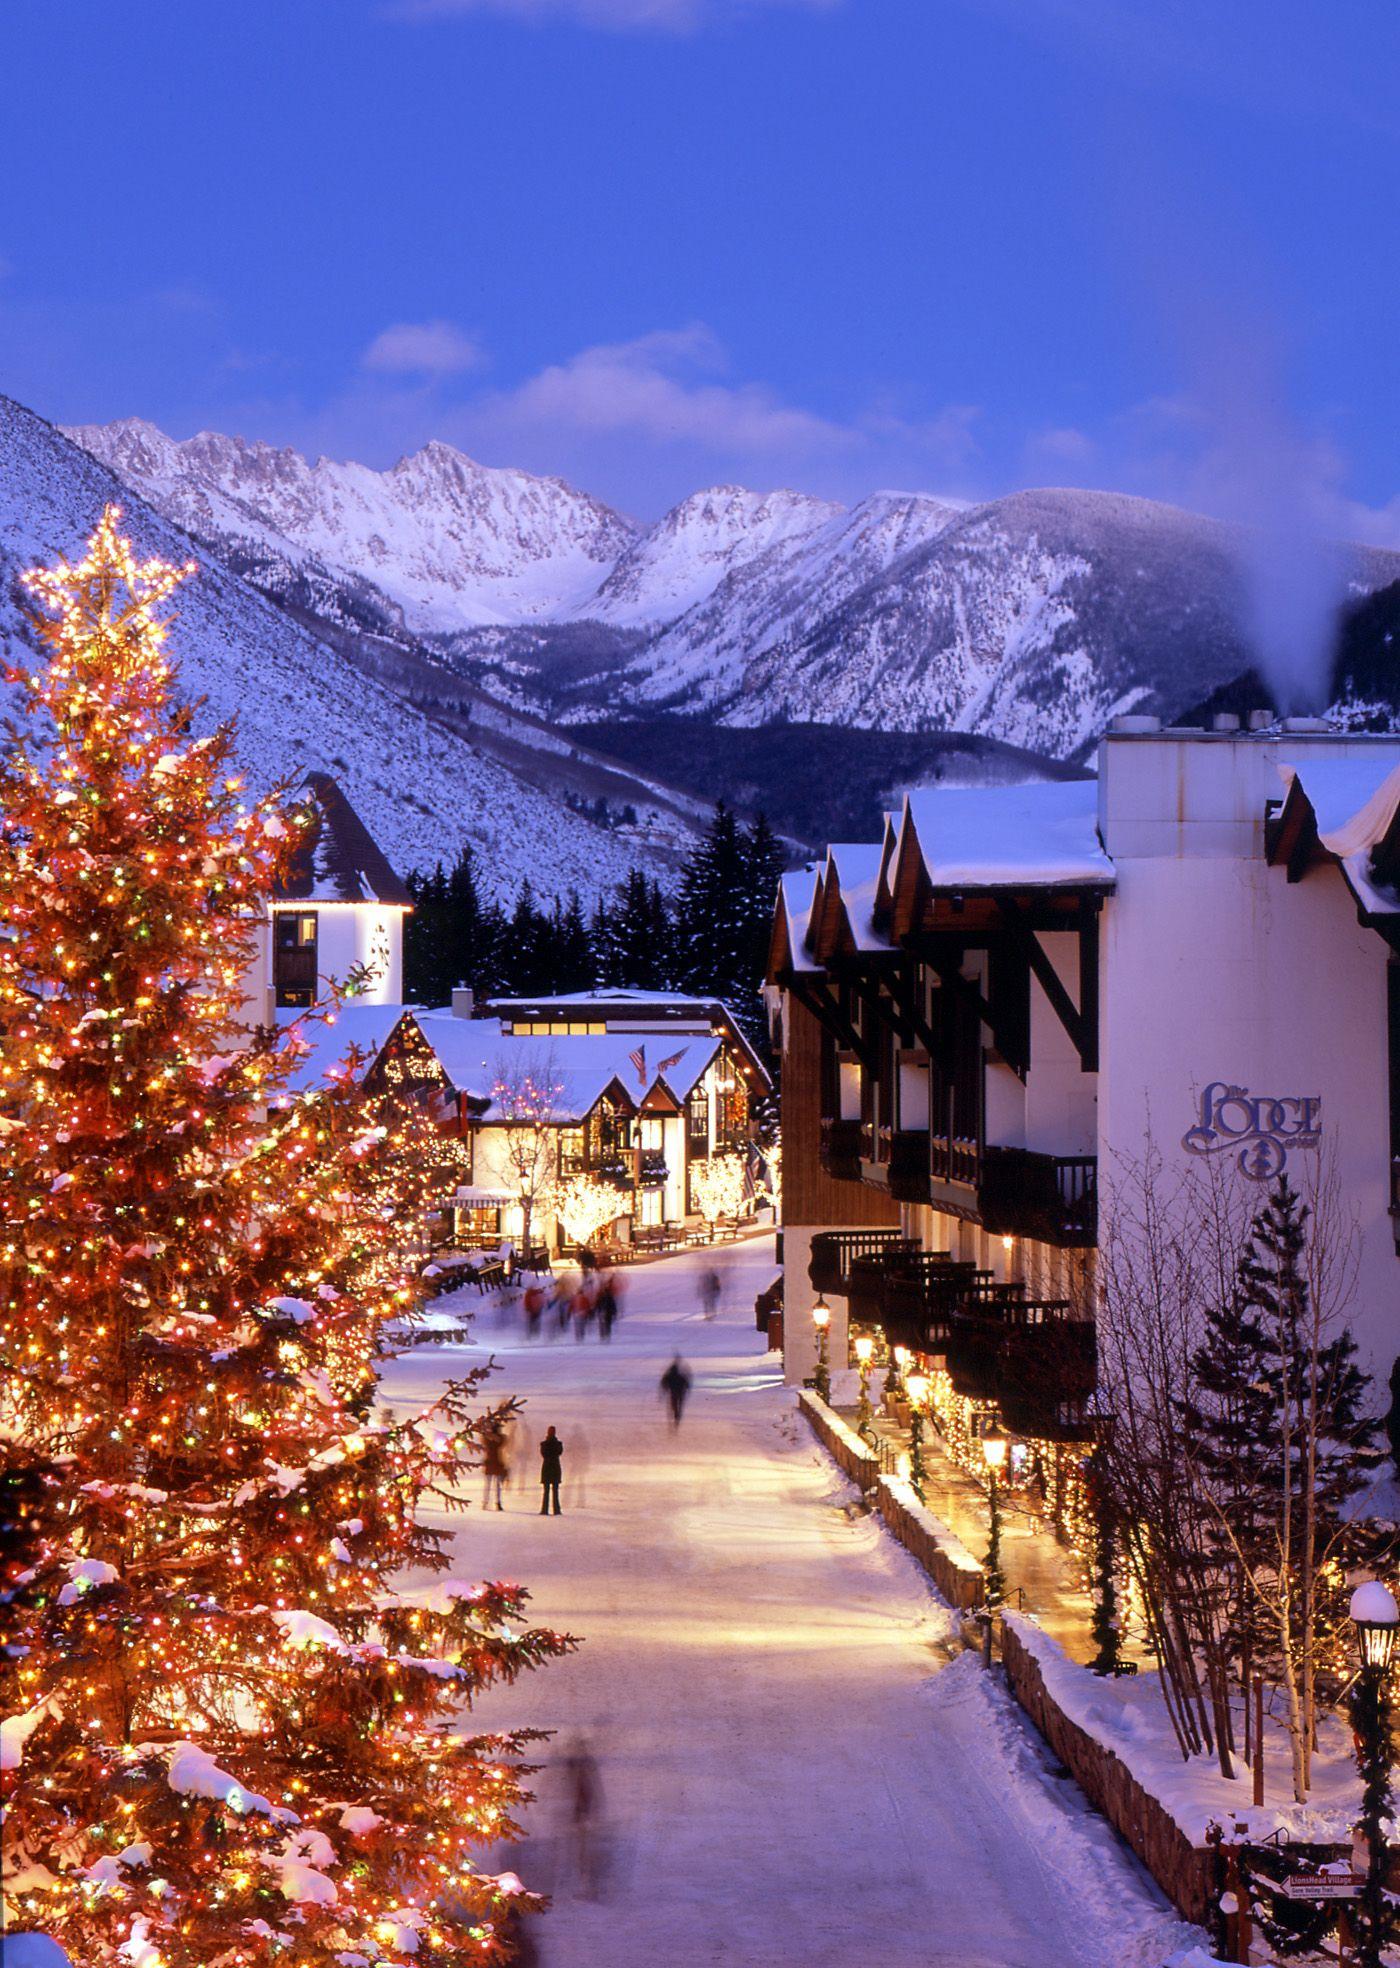 Vail Village In 2020 Winter Wonderland Christmas Winter Scenery Winter Scenes